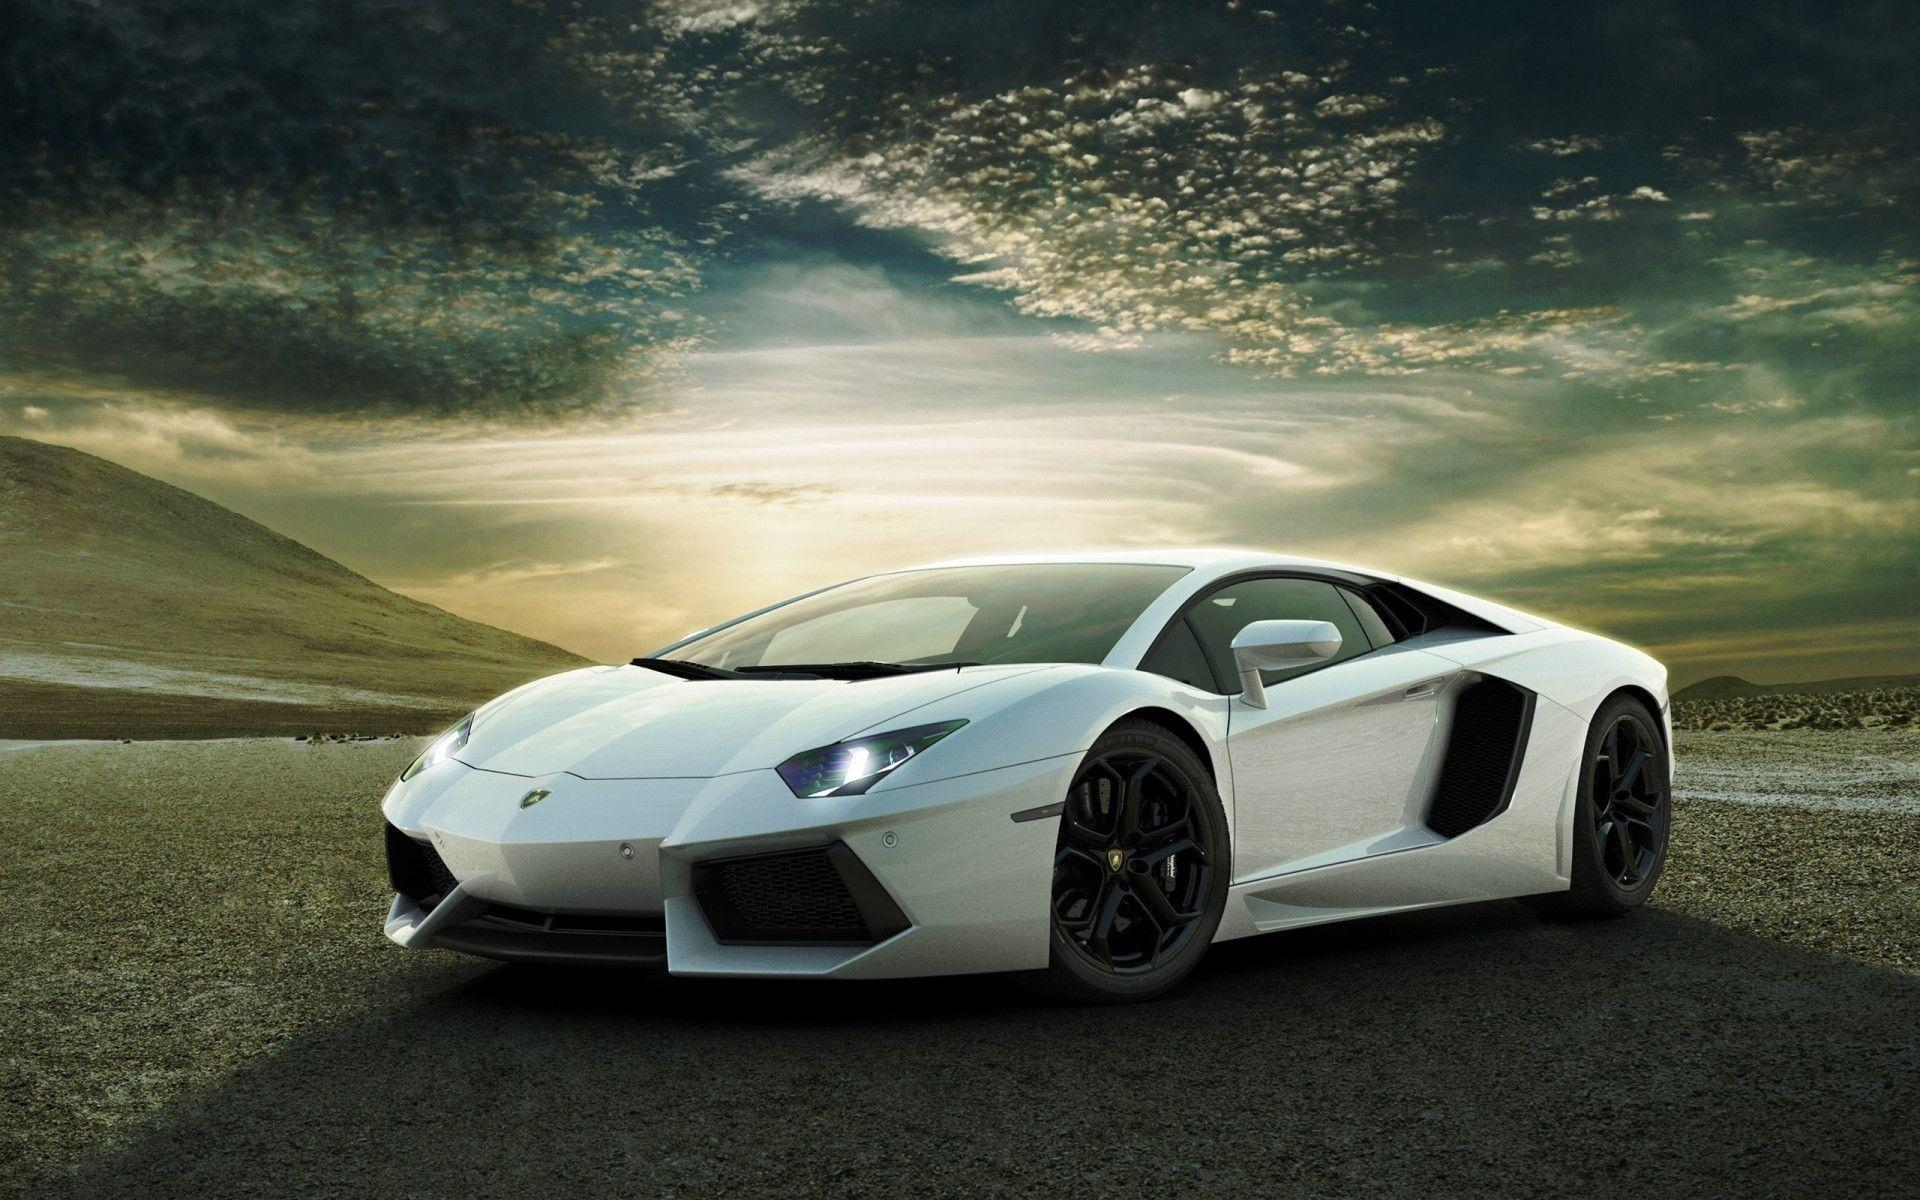 White Lamborghini Background in Cars - Wugange.